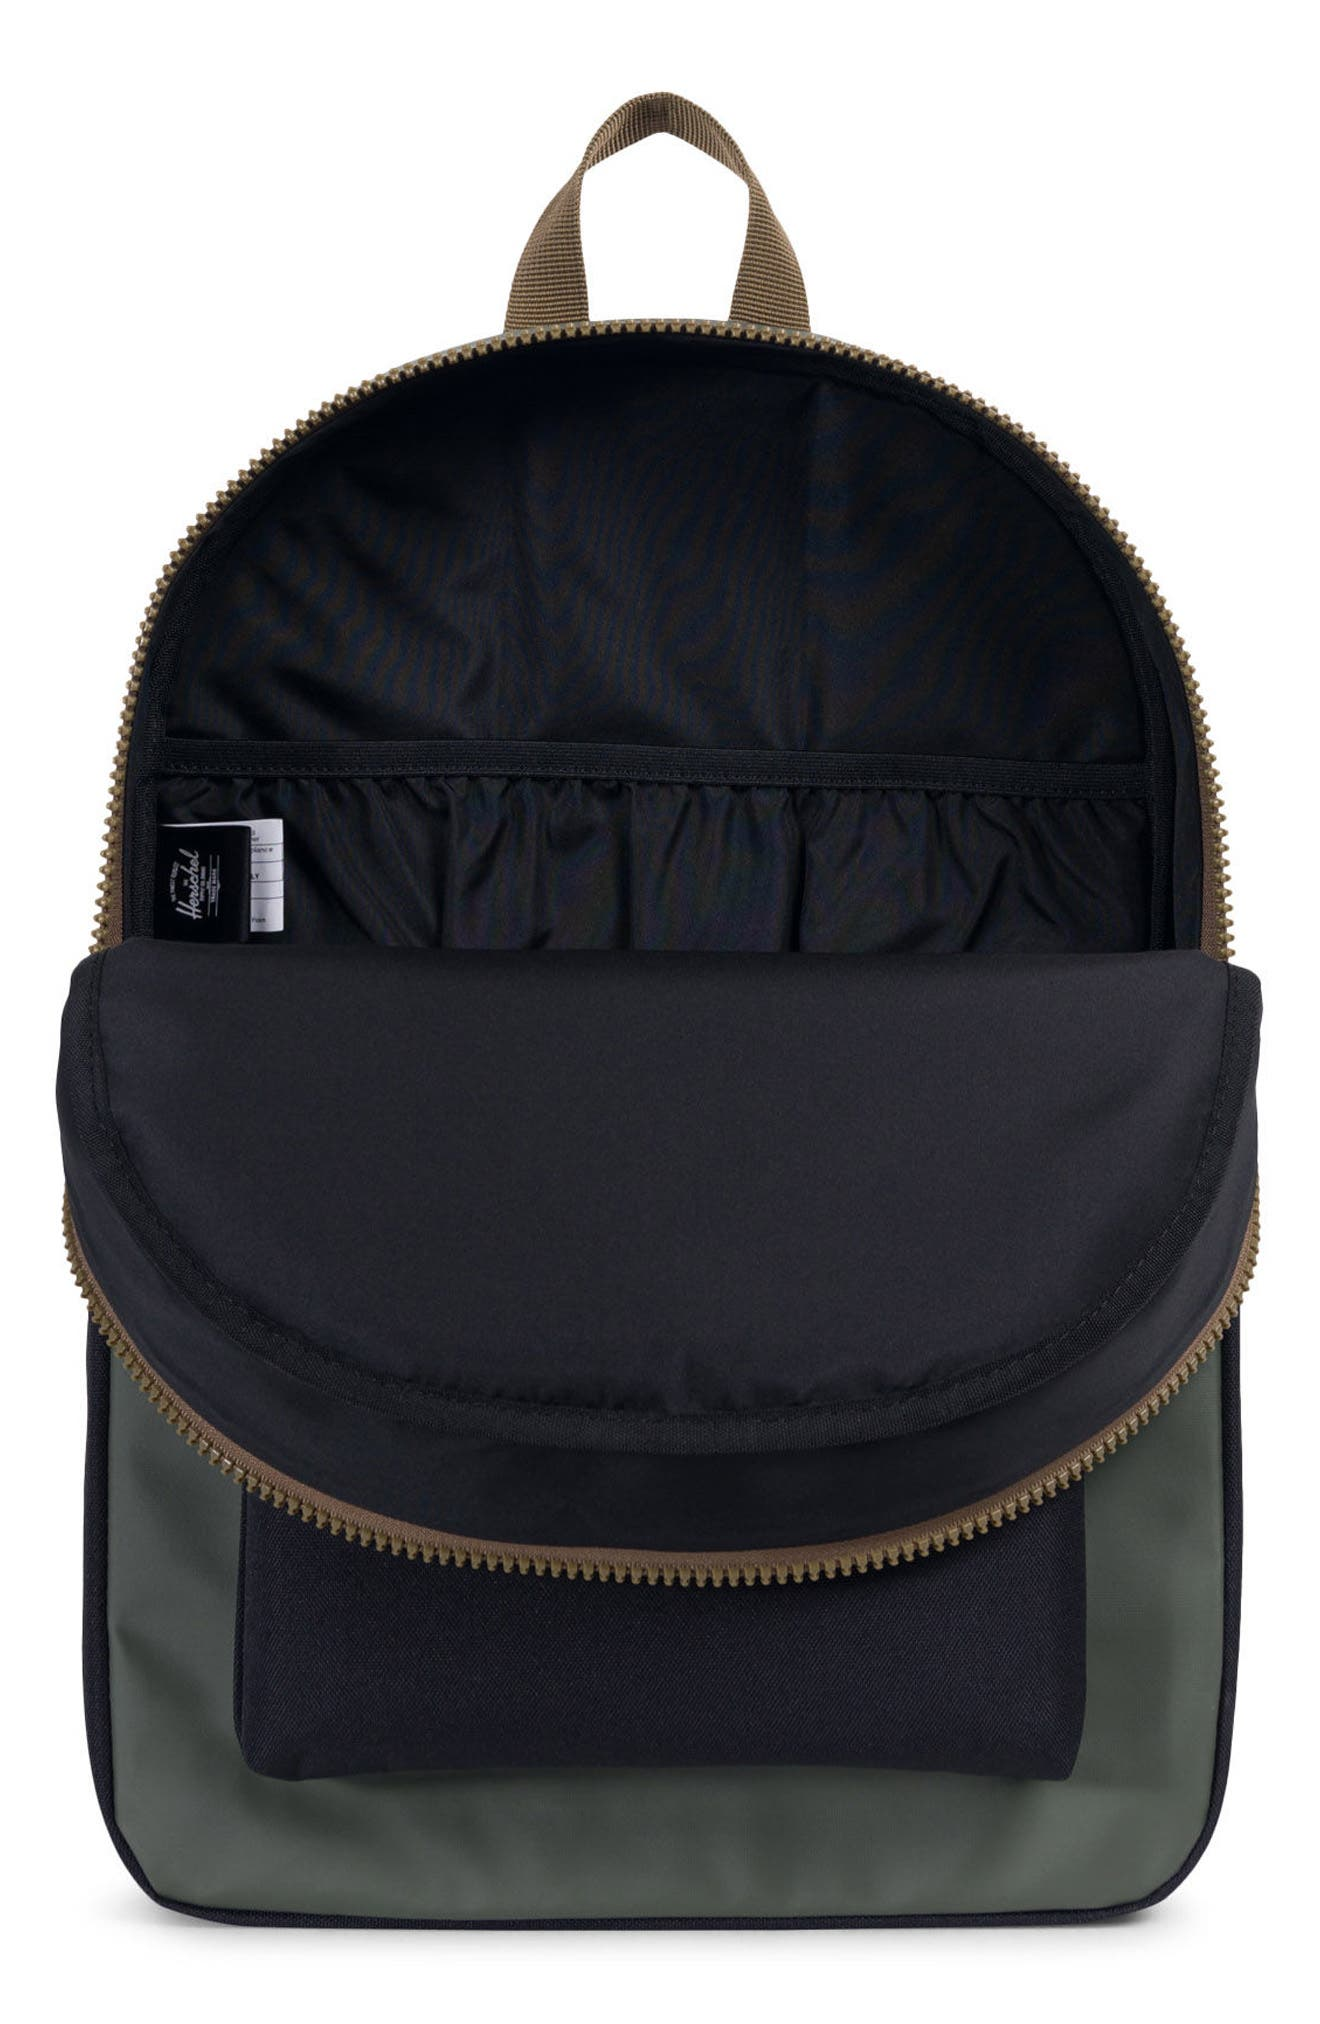 Winlaw Studio Backpack,                             Alternate thumbnail 3, color,                             Beetle Black/ Goth Olive